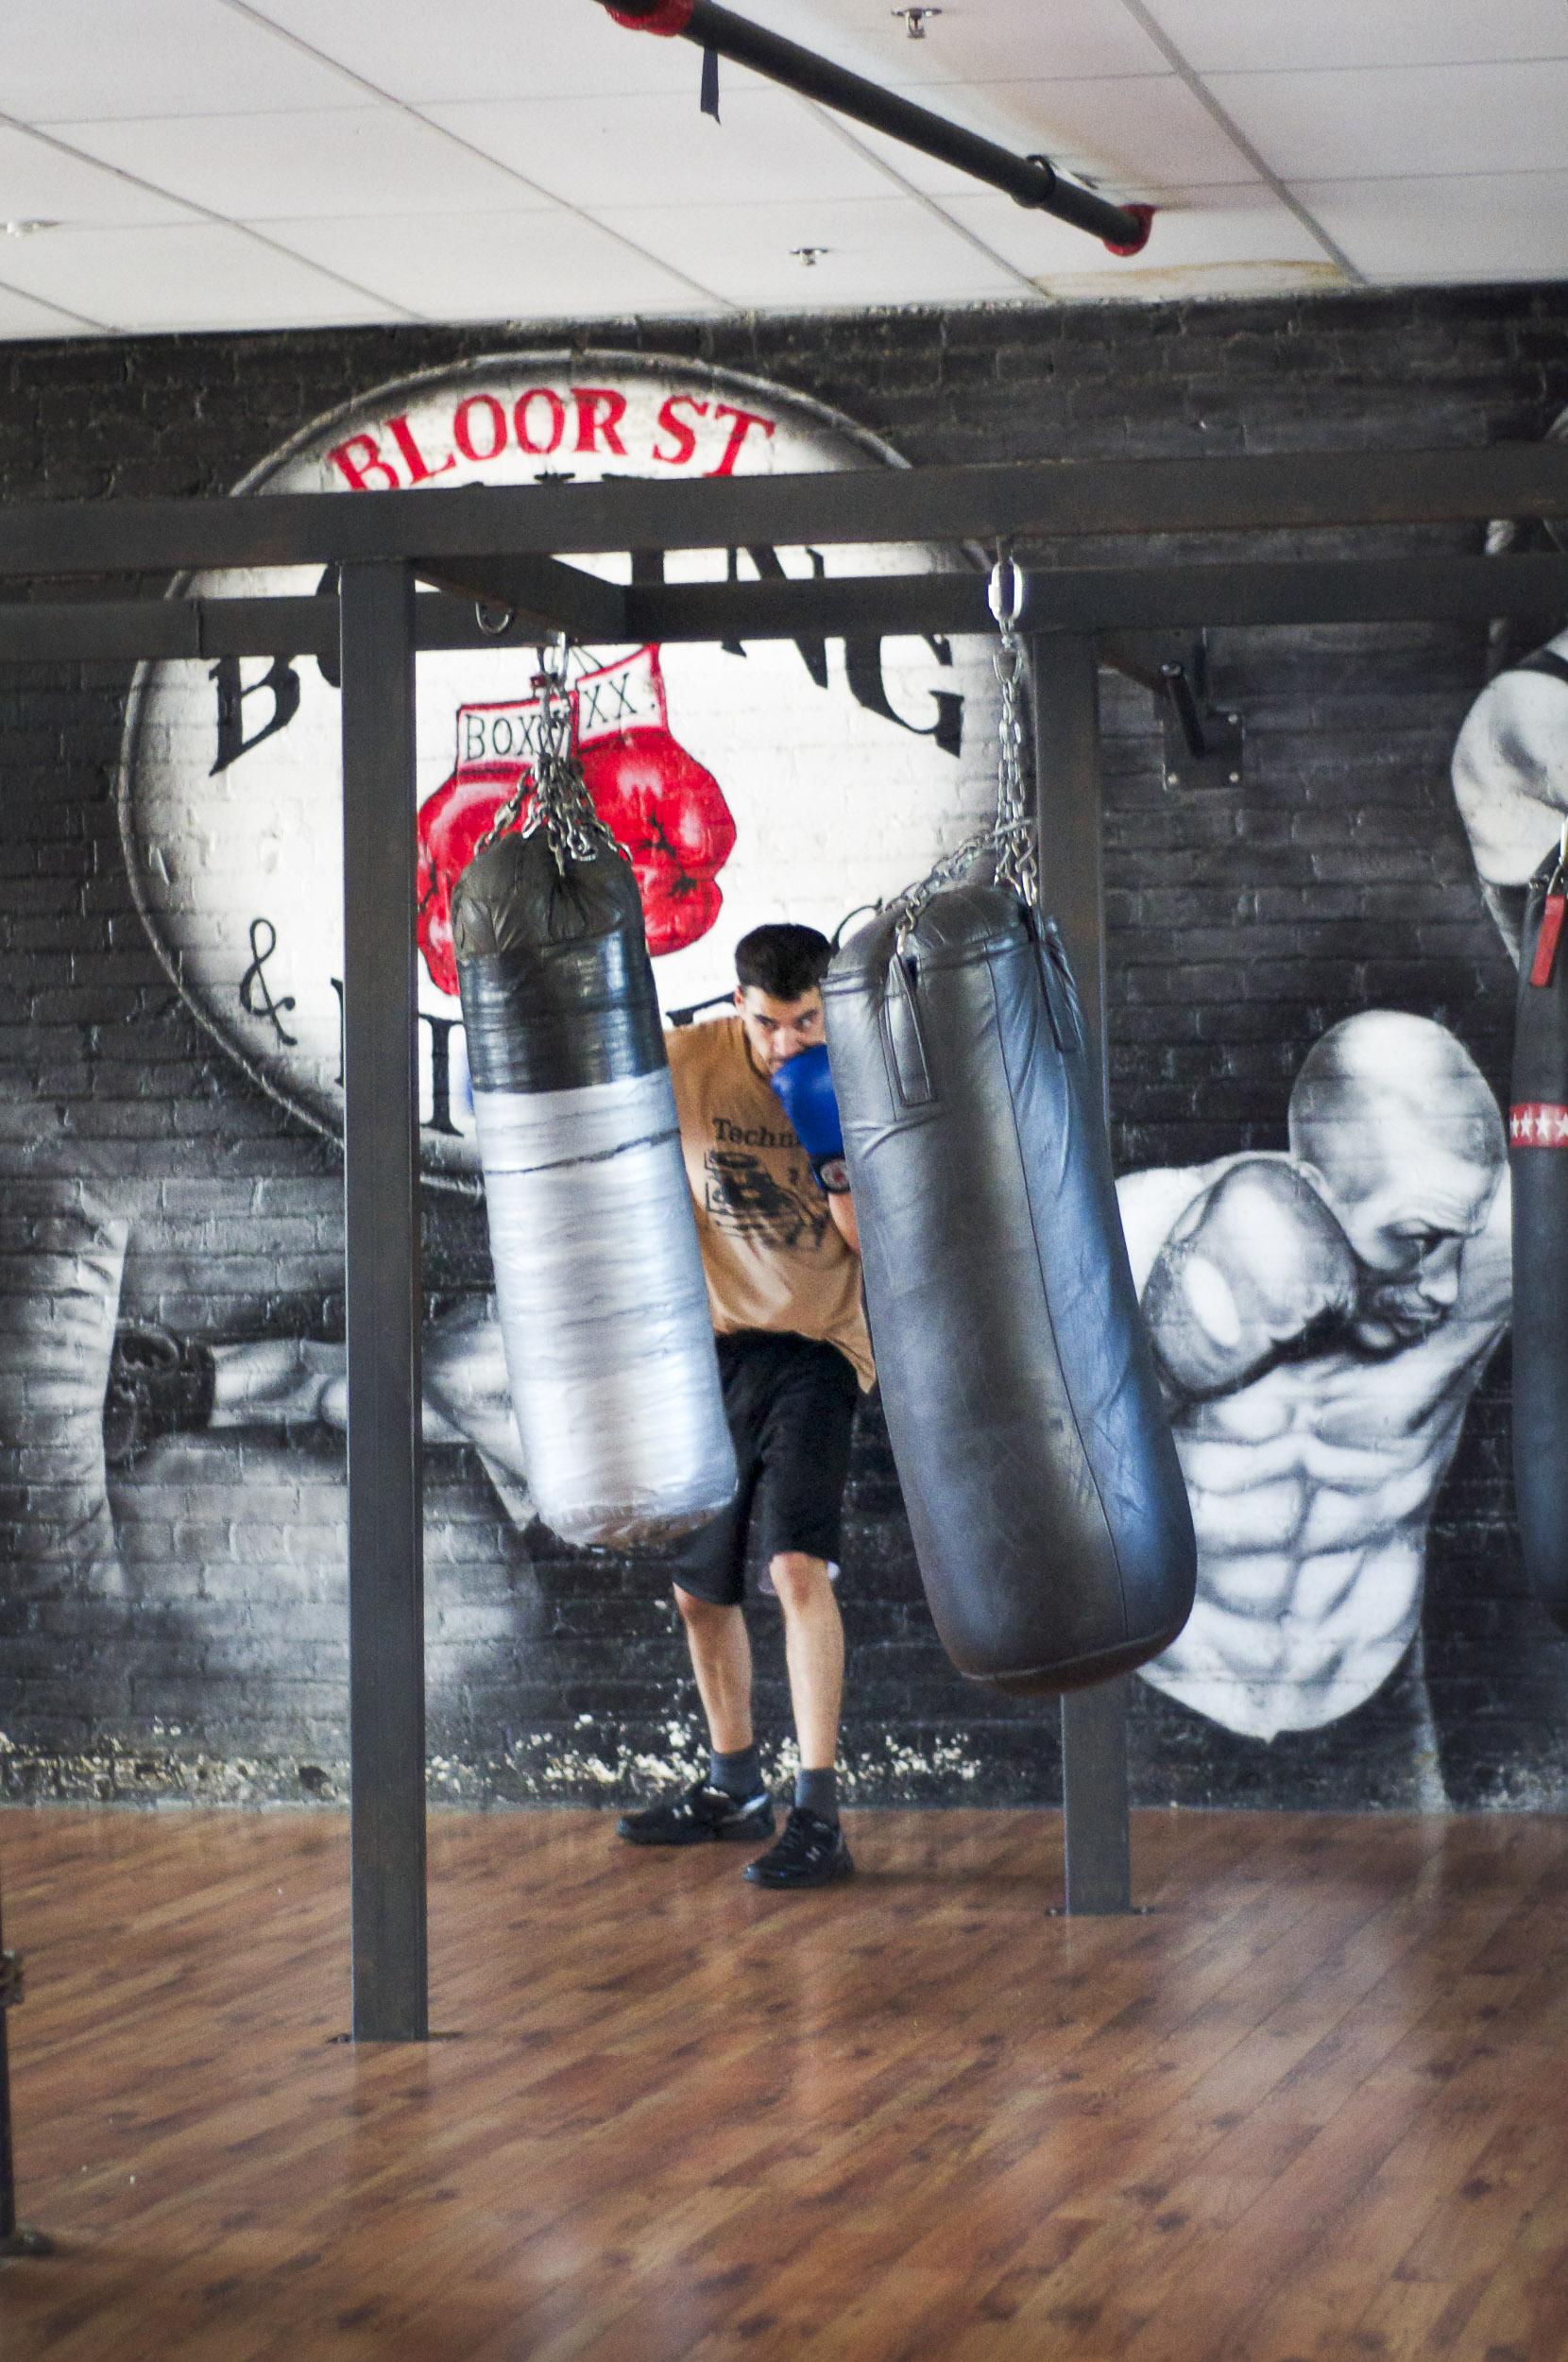 Boxing Club-773572907.jpg